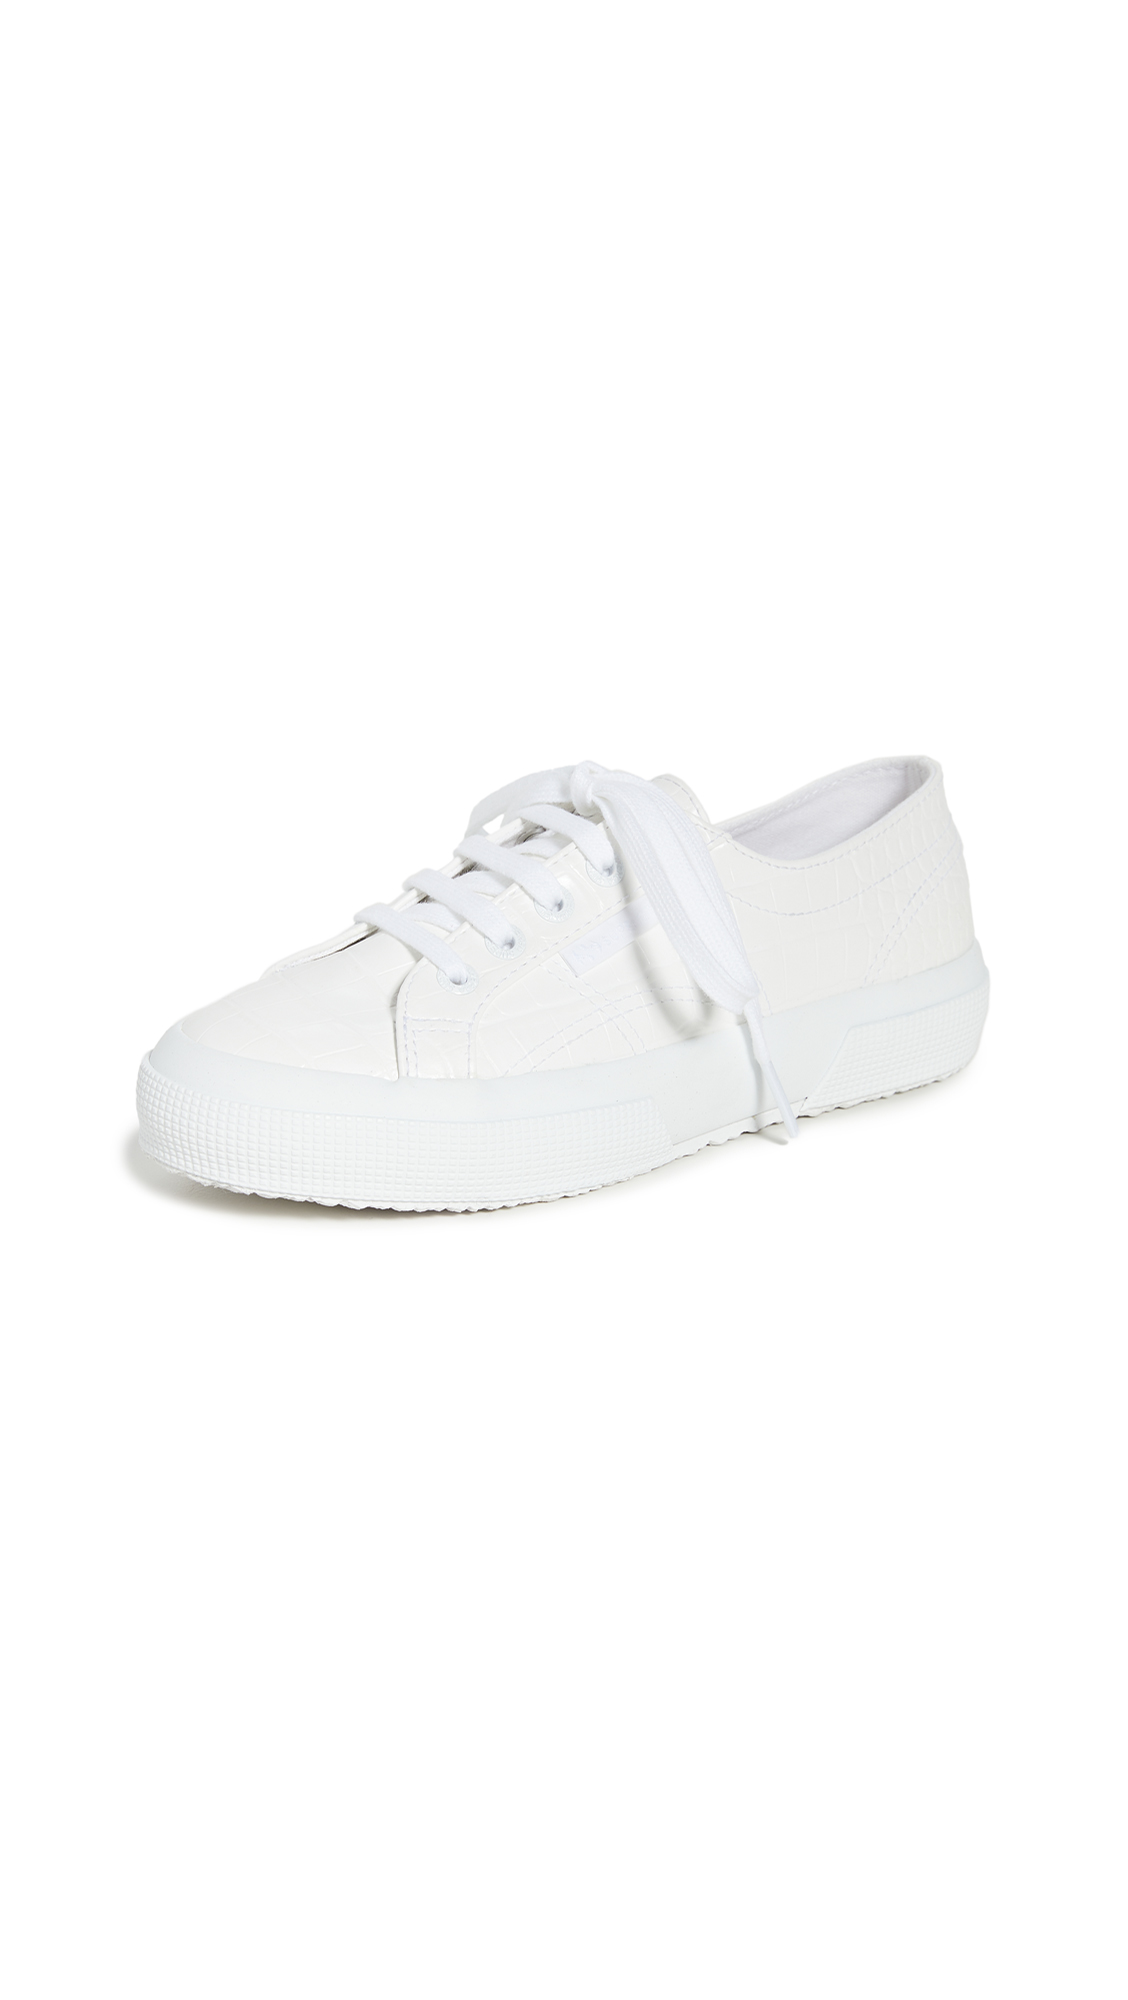 Superga 2750 Syntcrocodilew Sneakers - 30% Off Sale